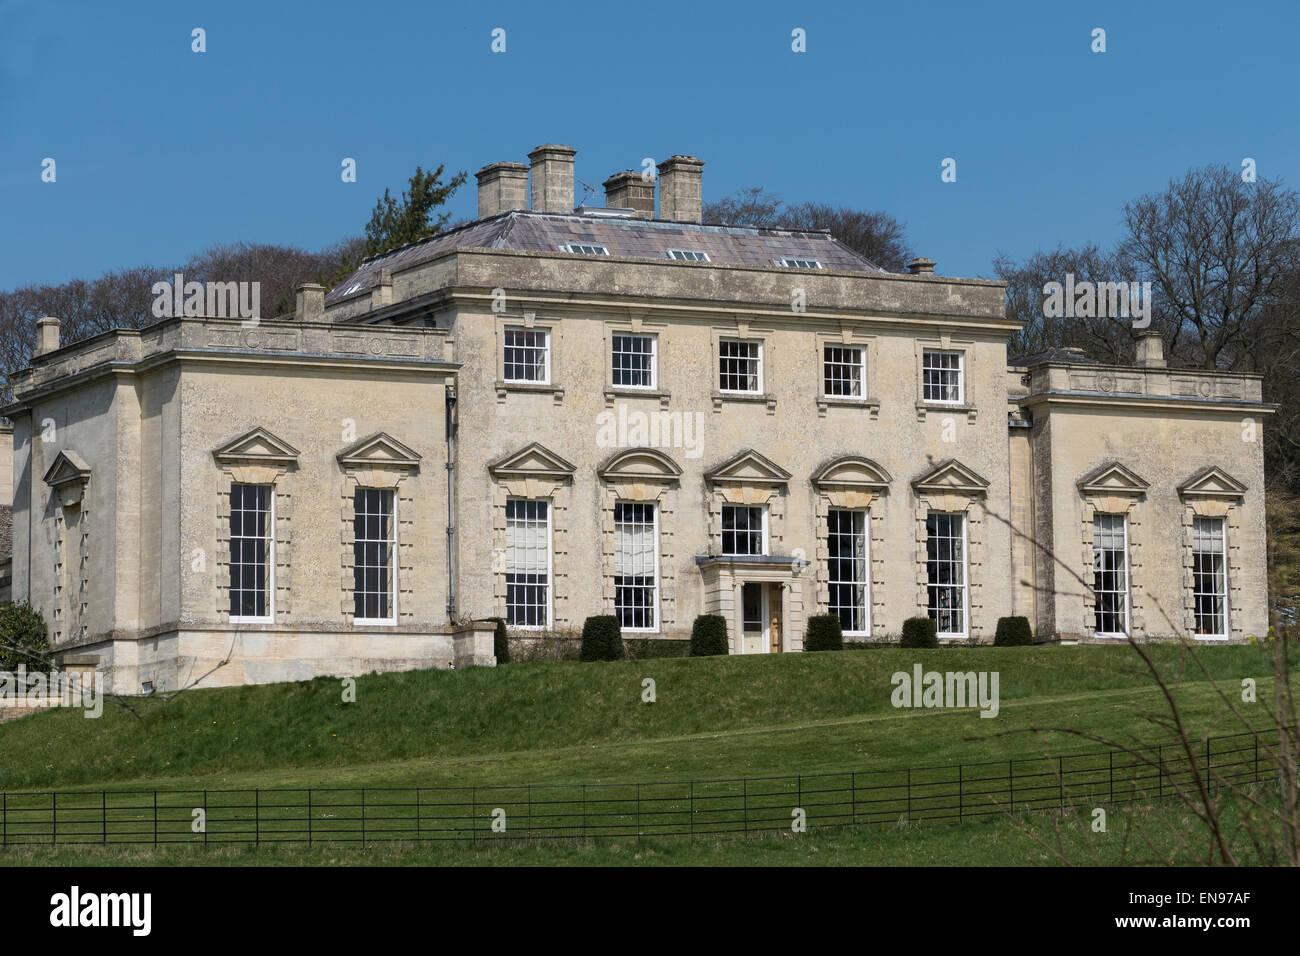 England, Gloucestershire, Painswick Rococo gardens, House - Stock Image